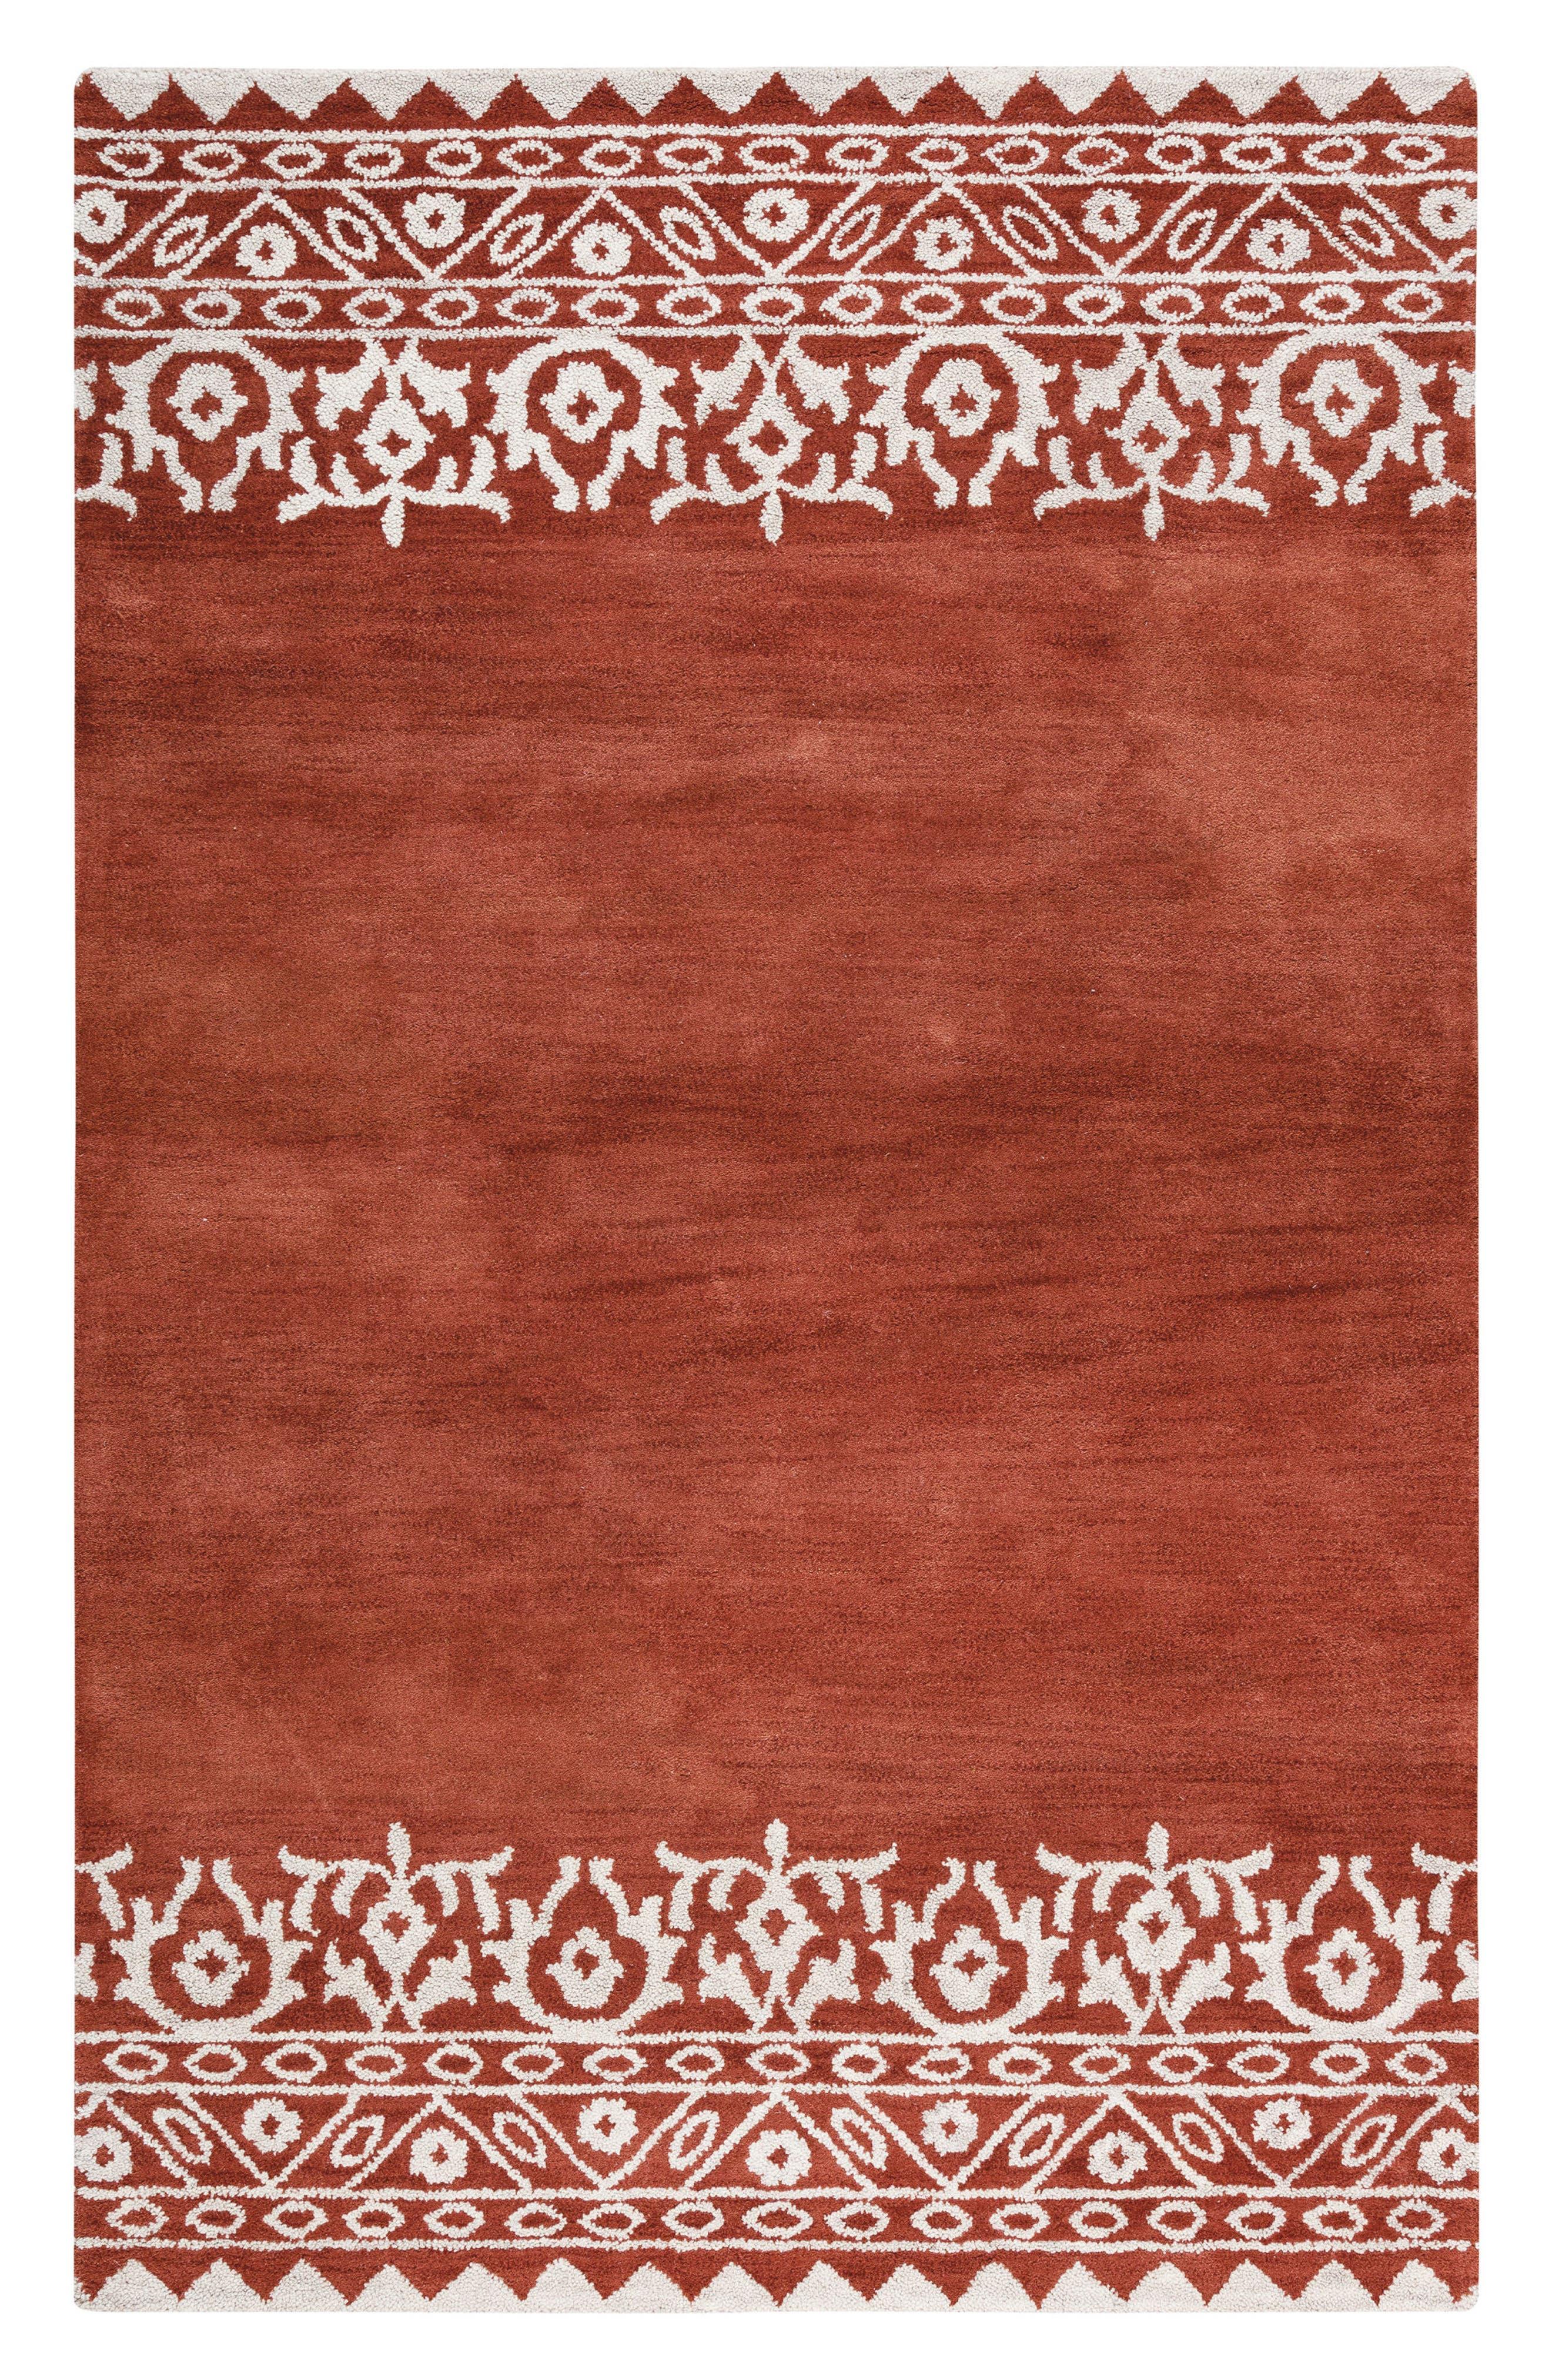 Framed Medallion Hand Tufted Wool Area Rug,                             Main thumbnail 3, color,